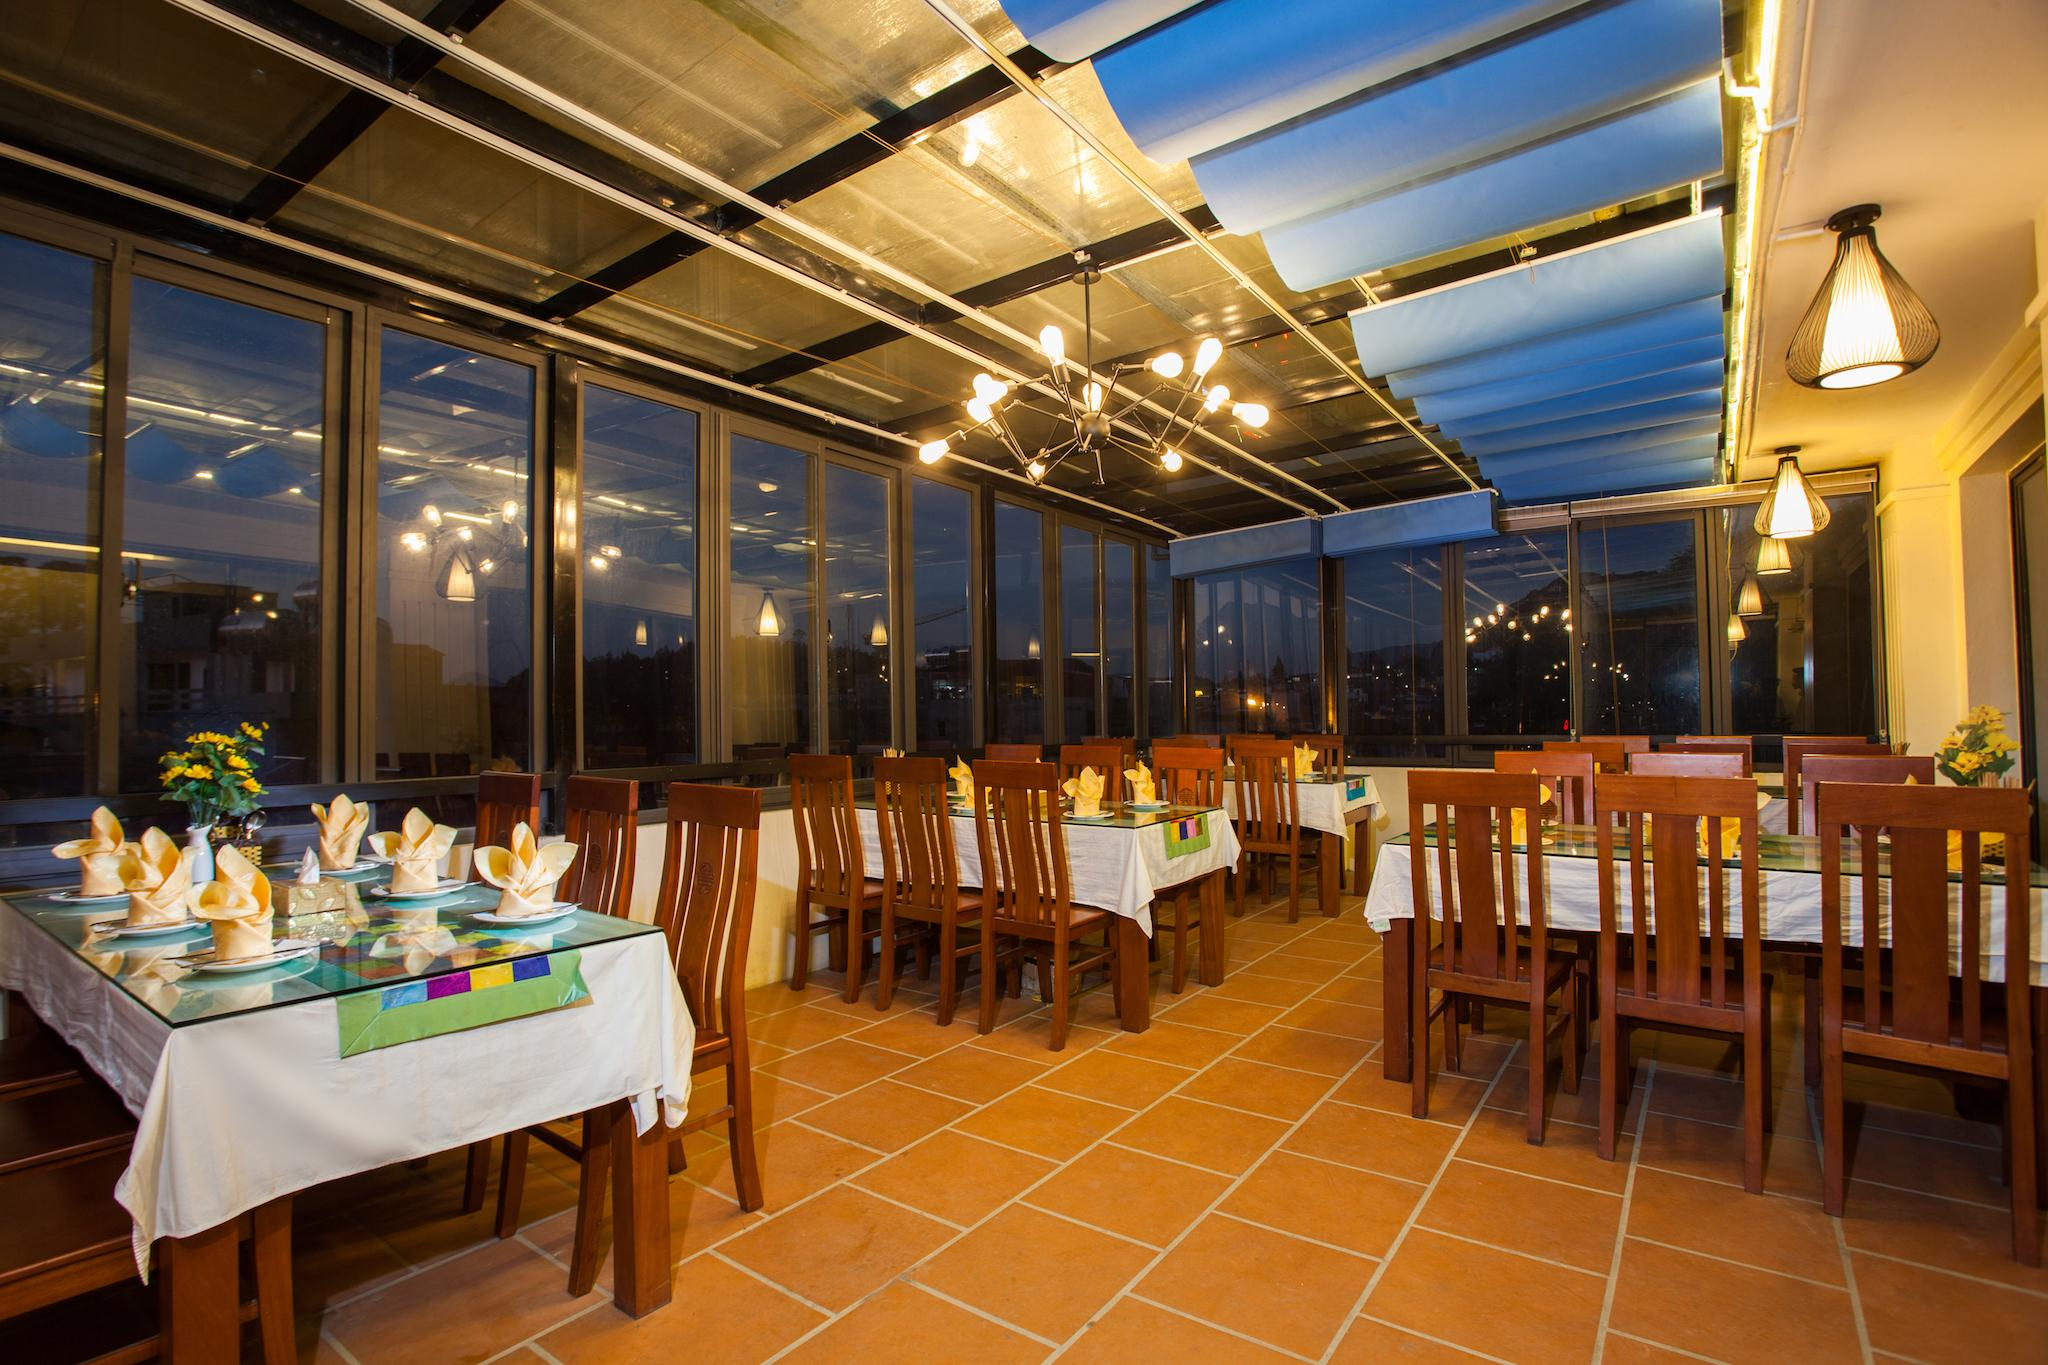 Khách sạn Sapa Majestic